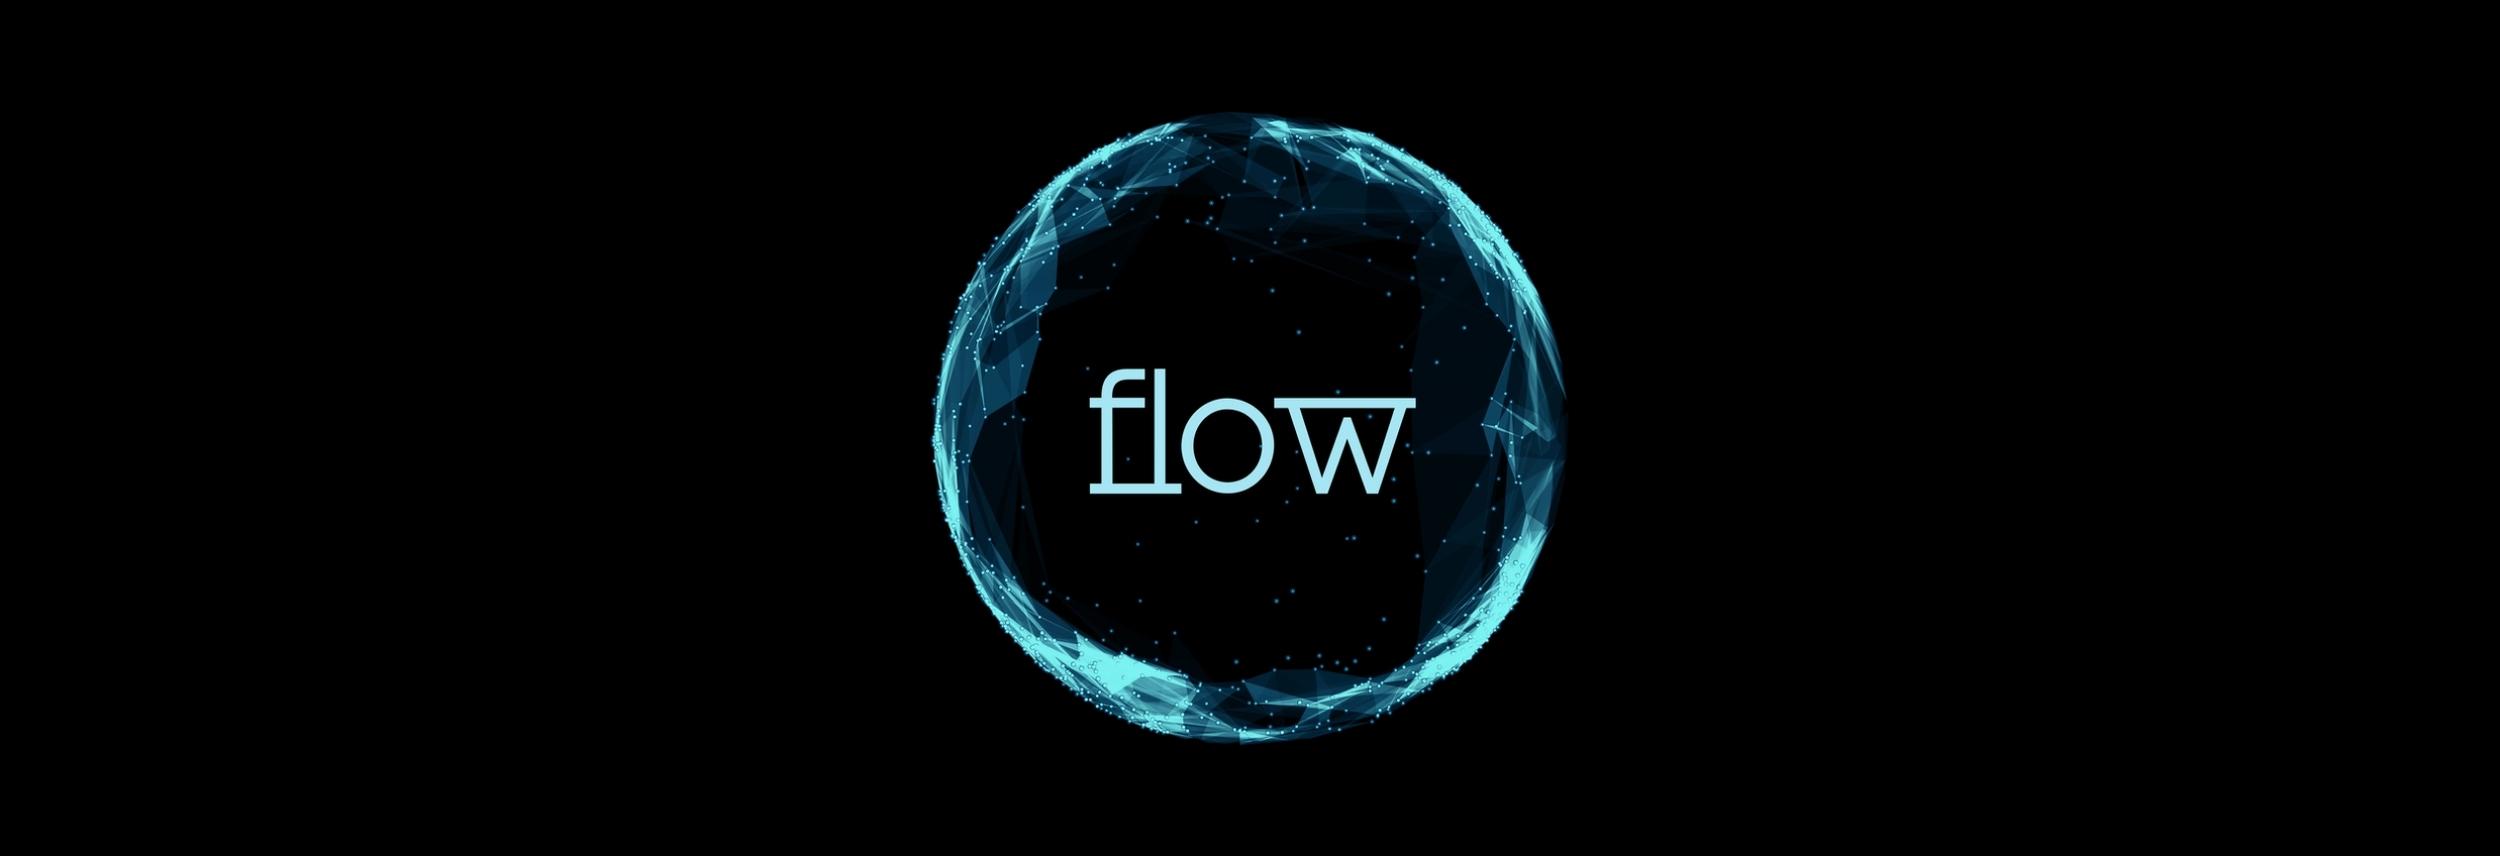 tronflow.jpg